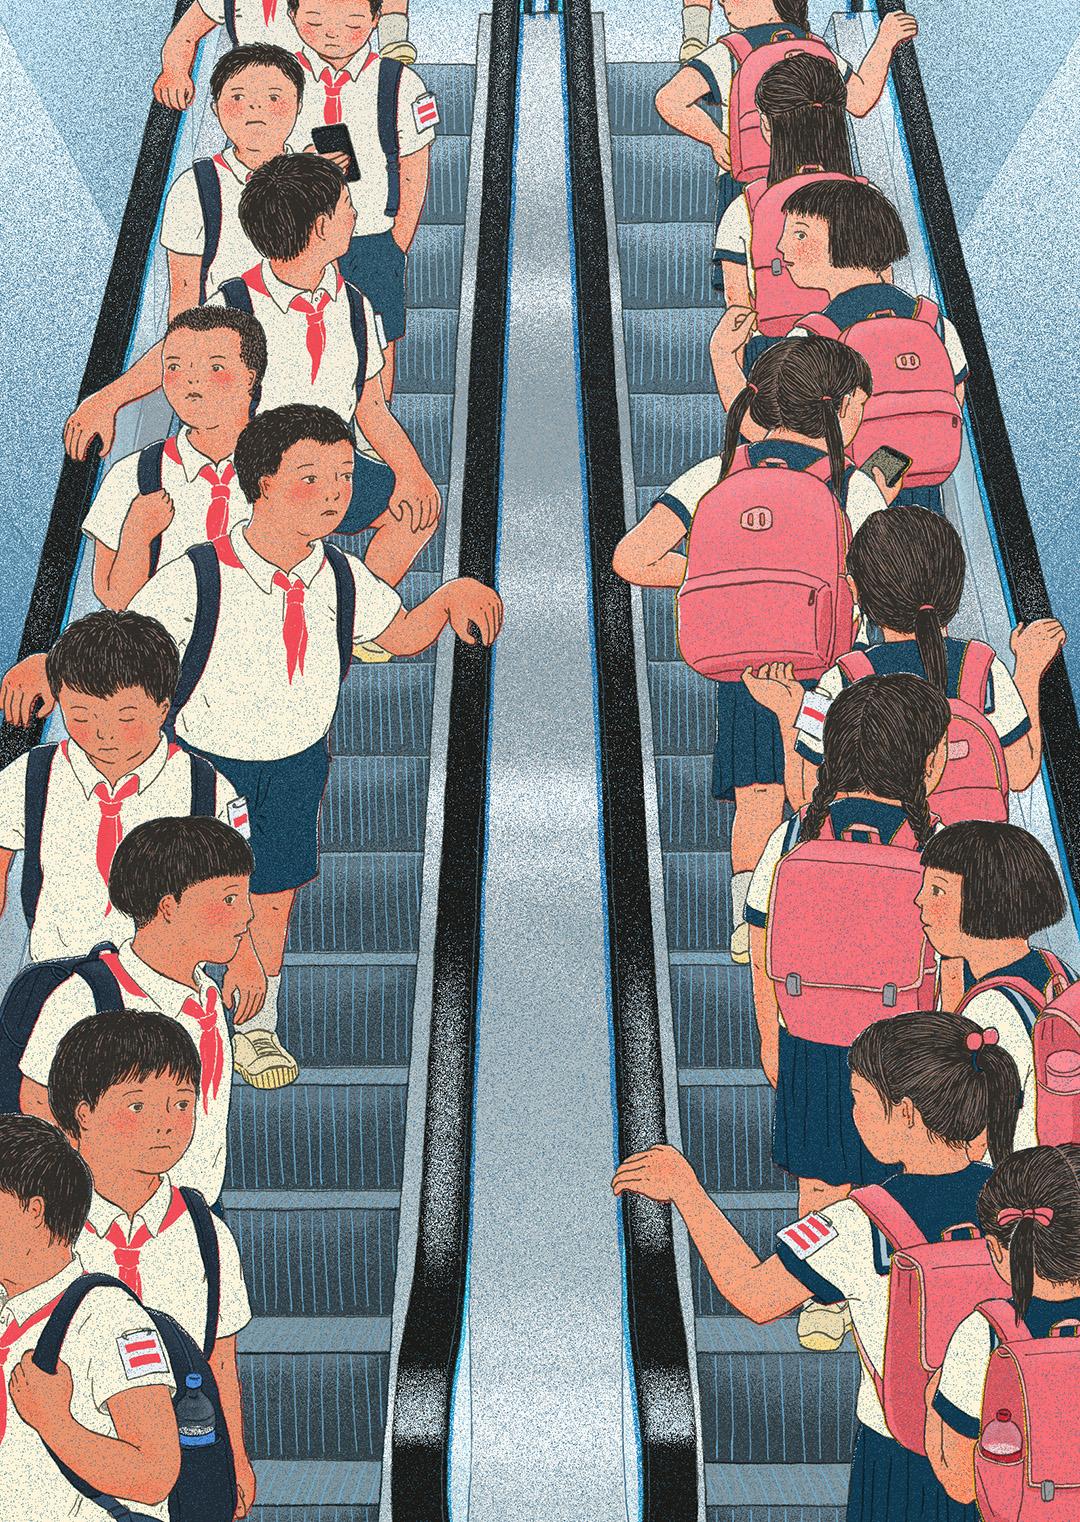 GirlsclubAsia-Xinmei-Liu-escalator